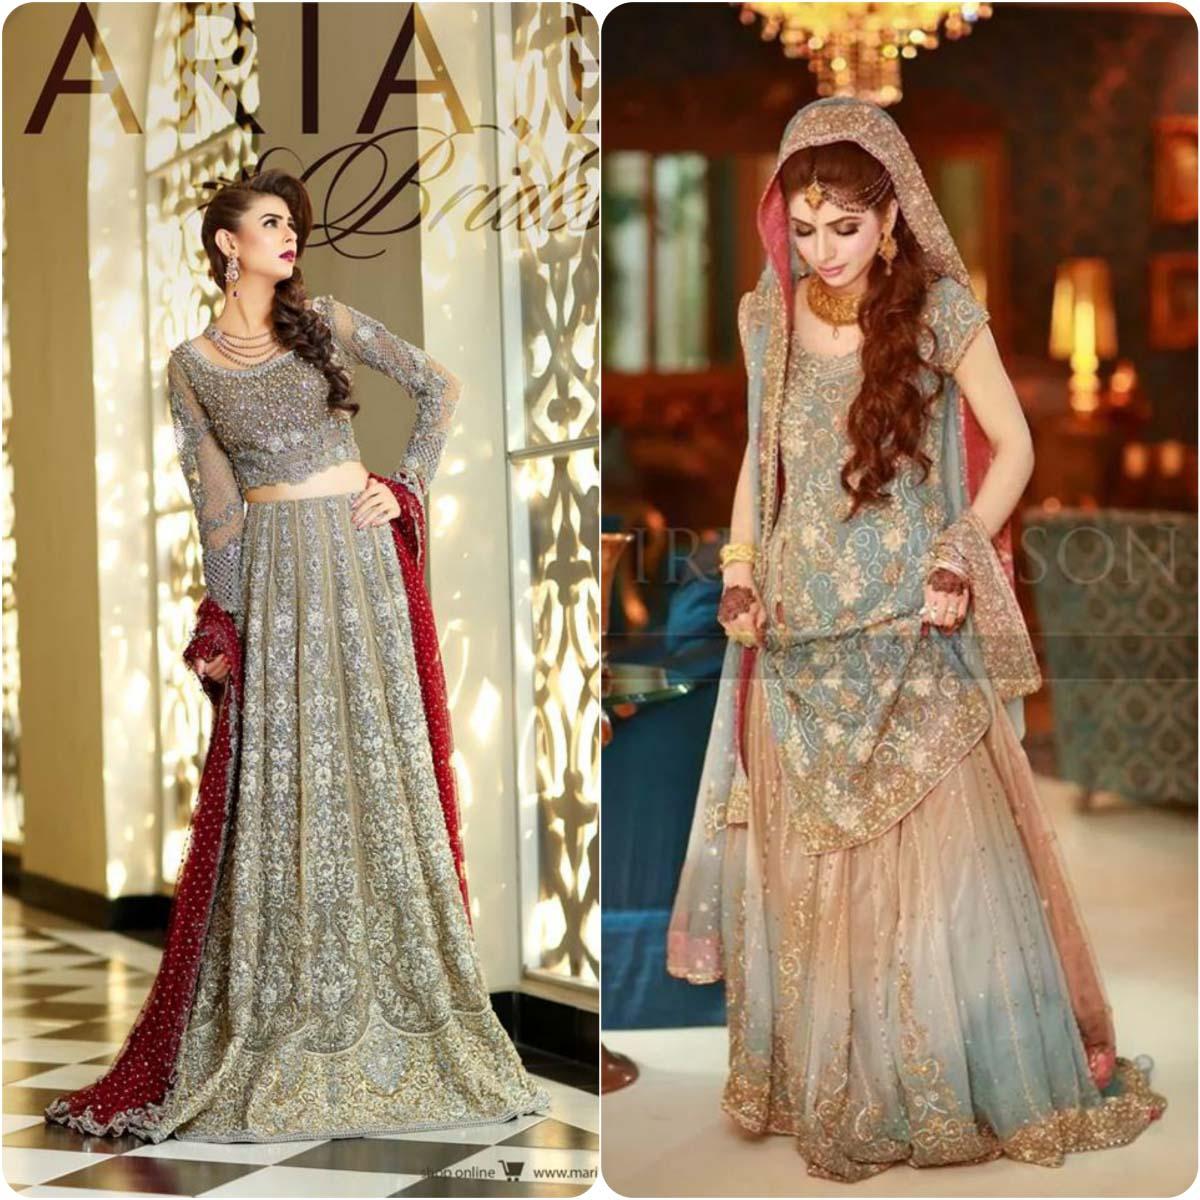 best-bridal-walima-dresses-2017-2018-designs-colors-5